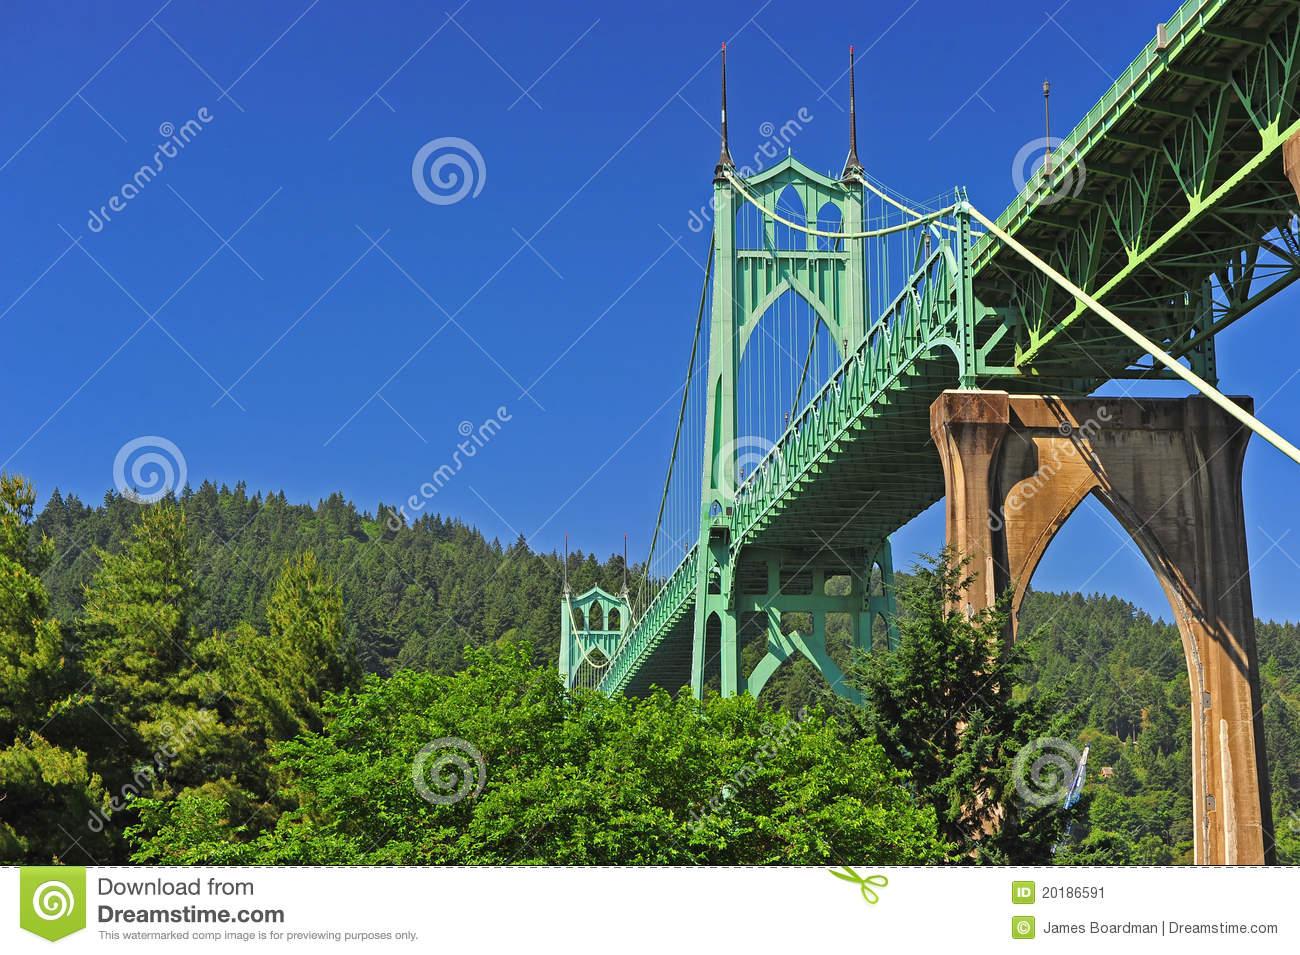 Bridge Towering Above The Trees Stock Image.